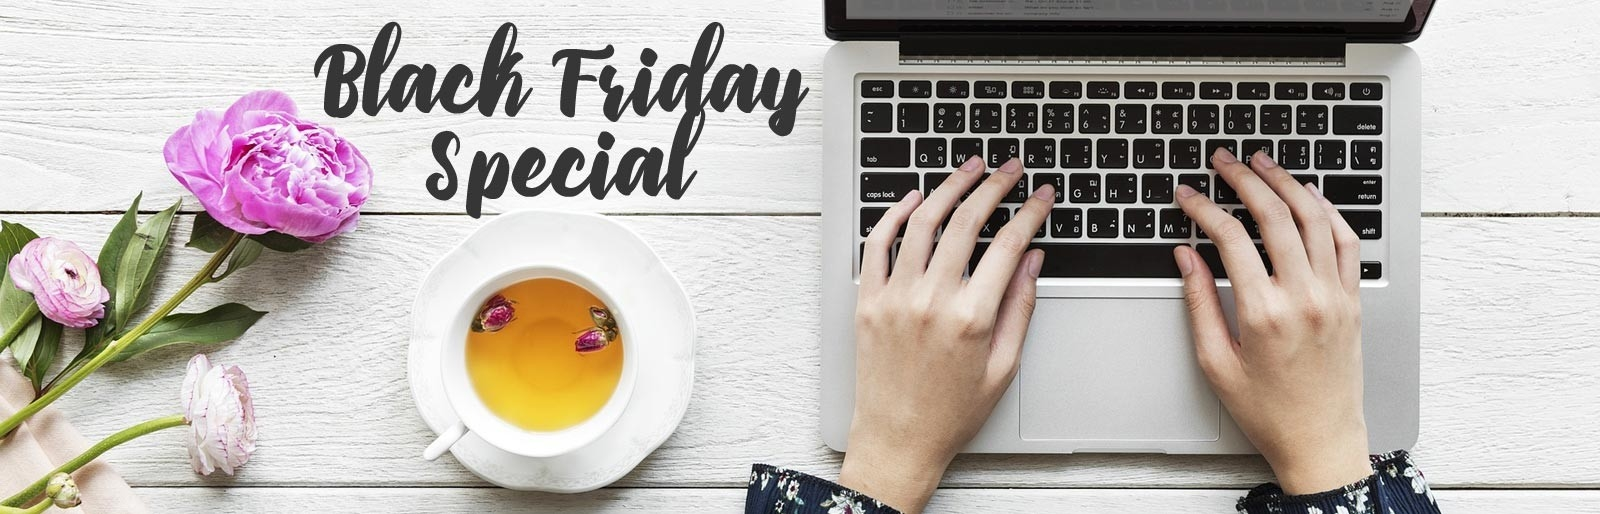 E-Invites Black Friday Special